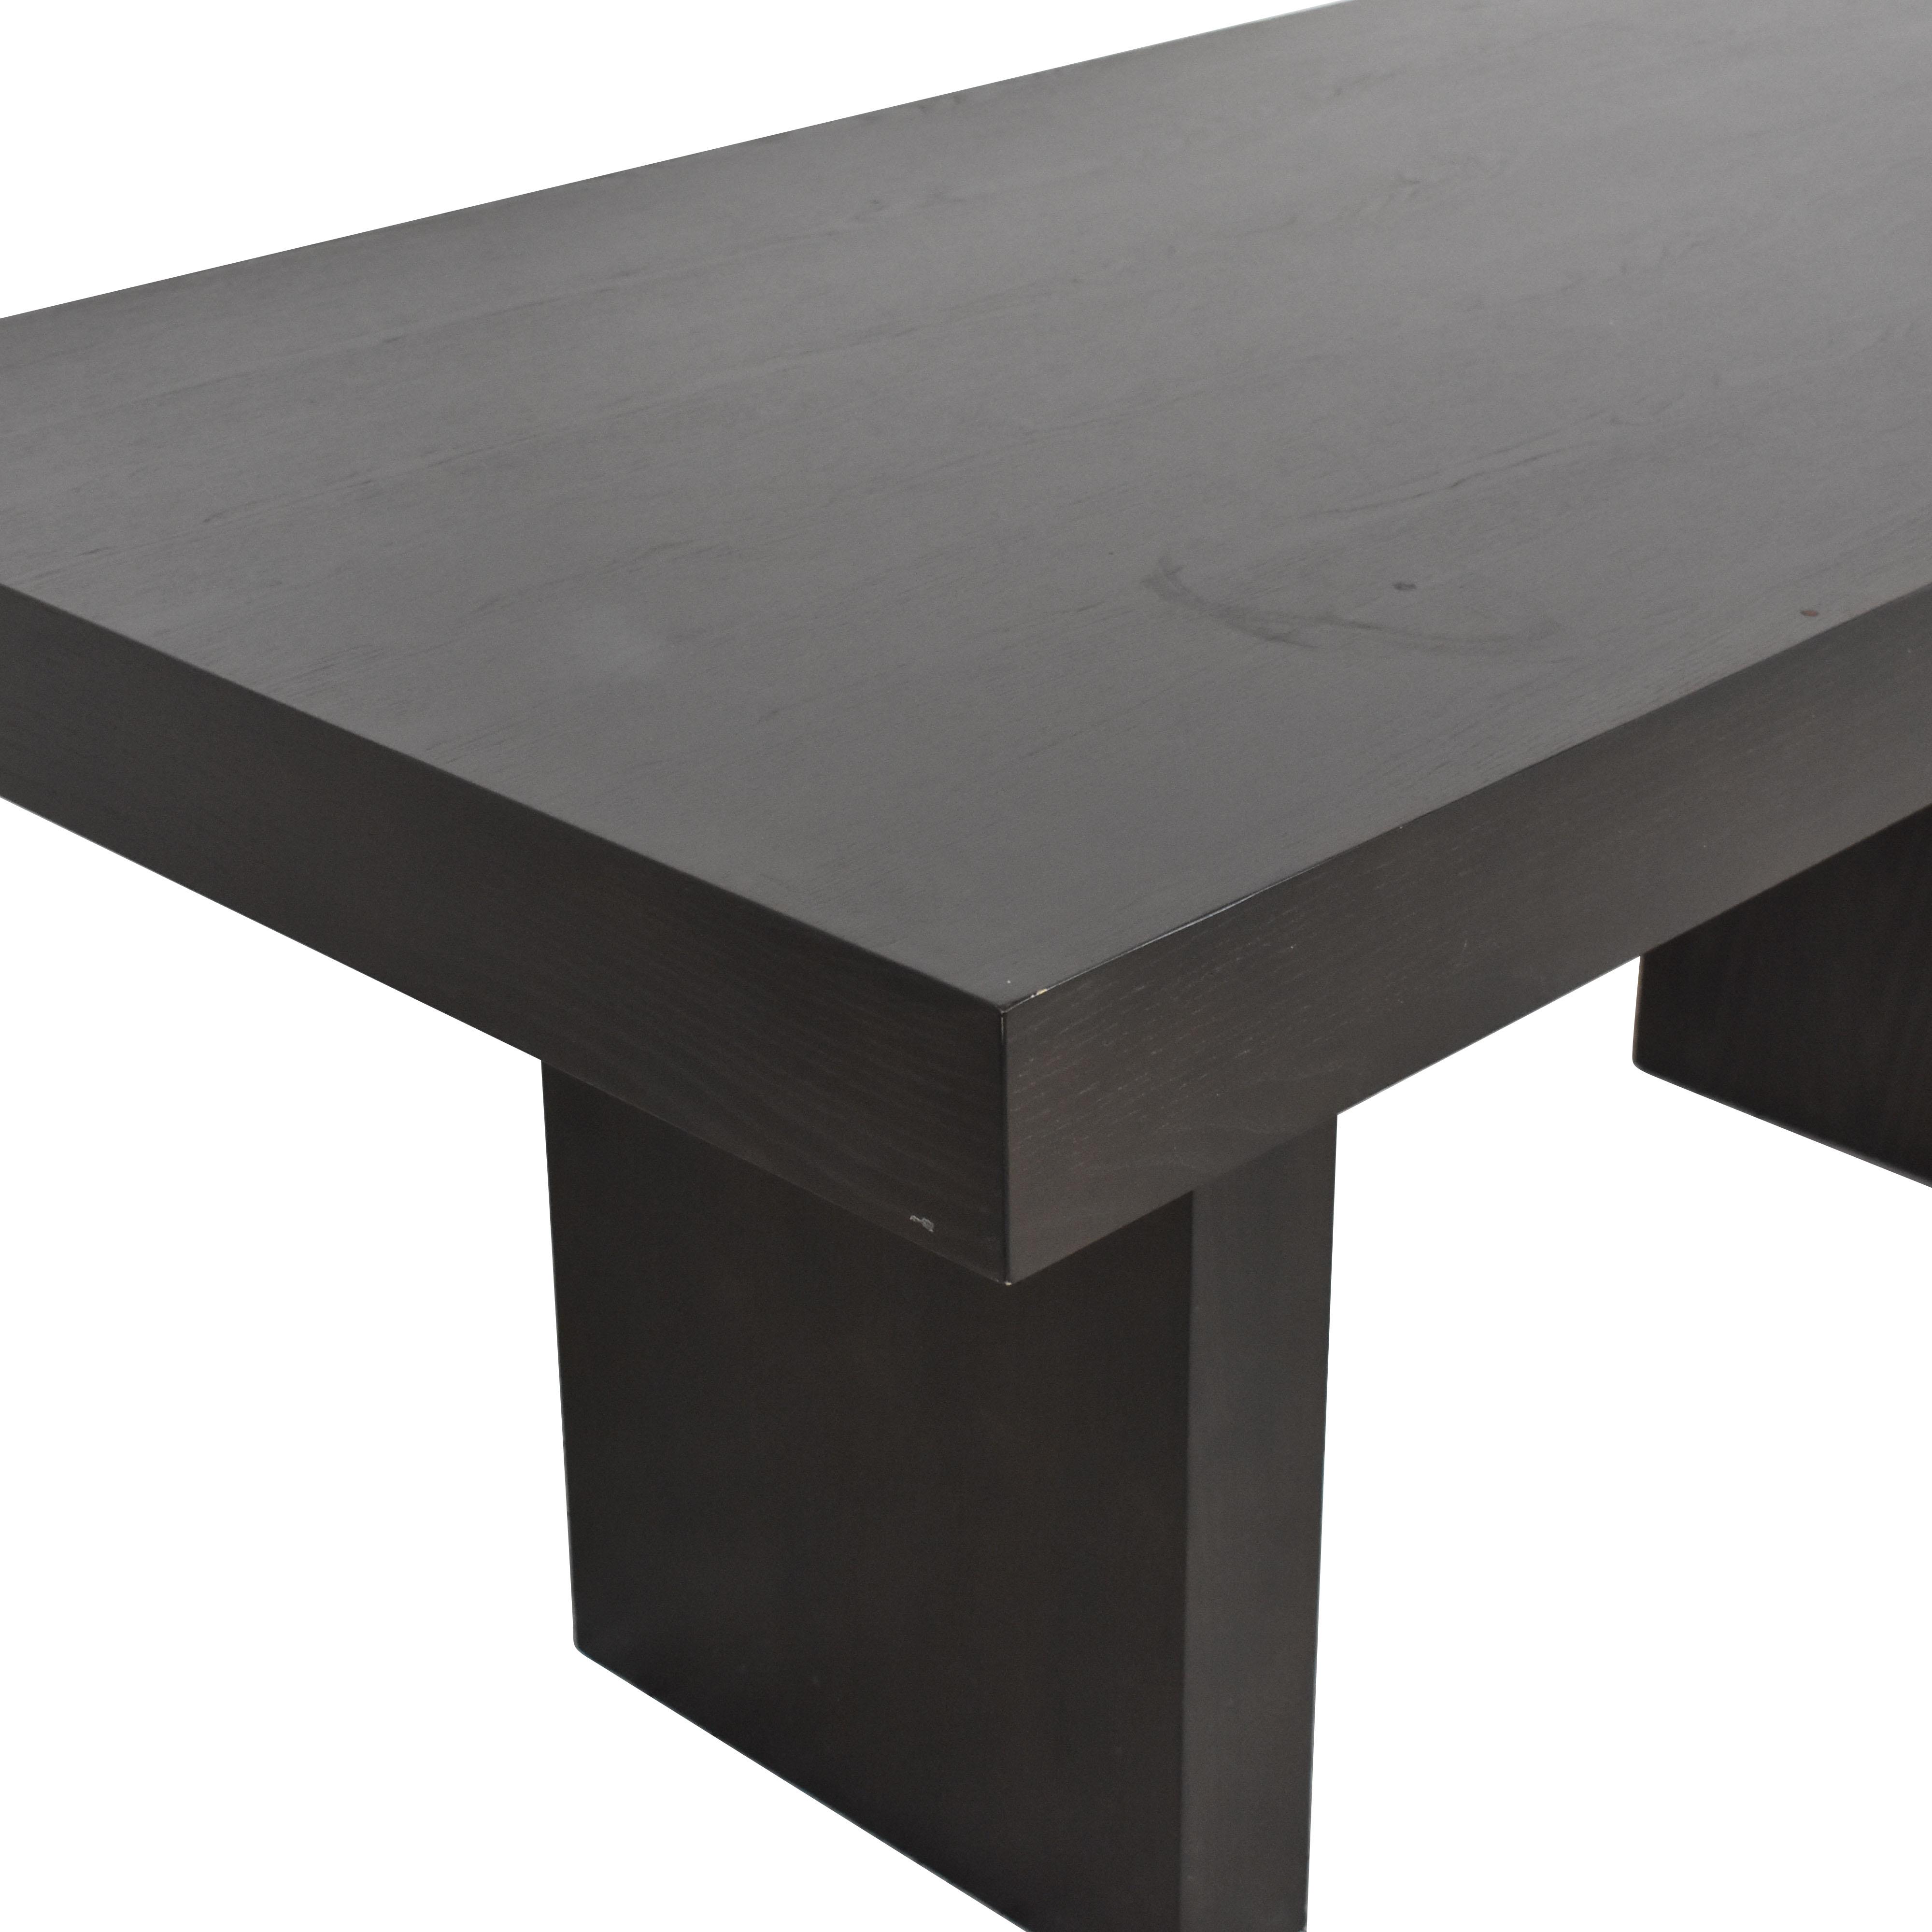 West Elm West Elm Terra Dining Table dimensions